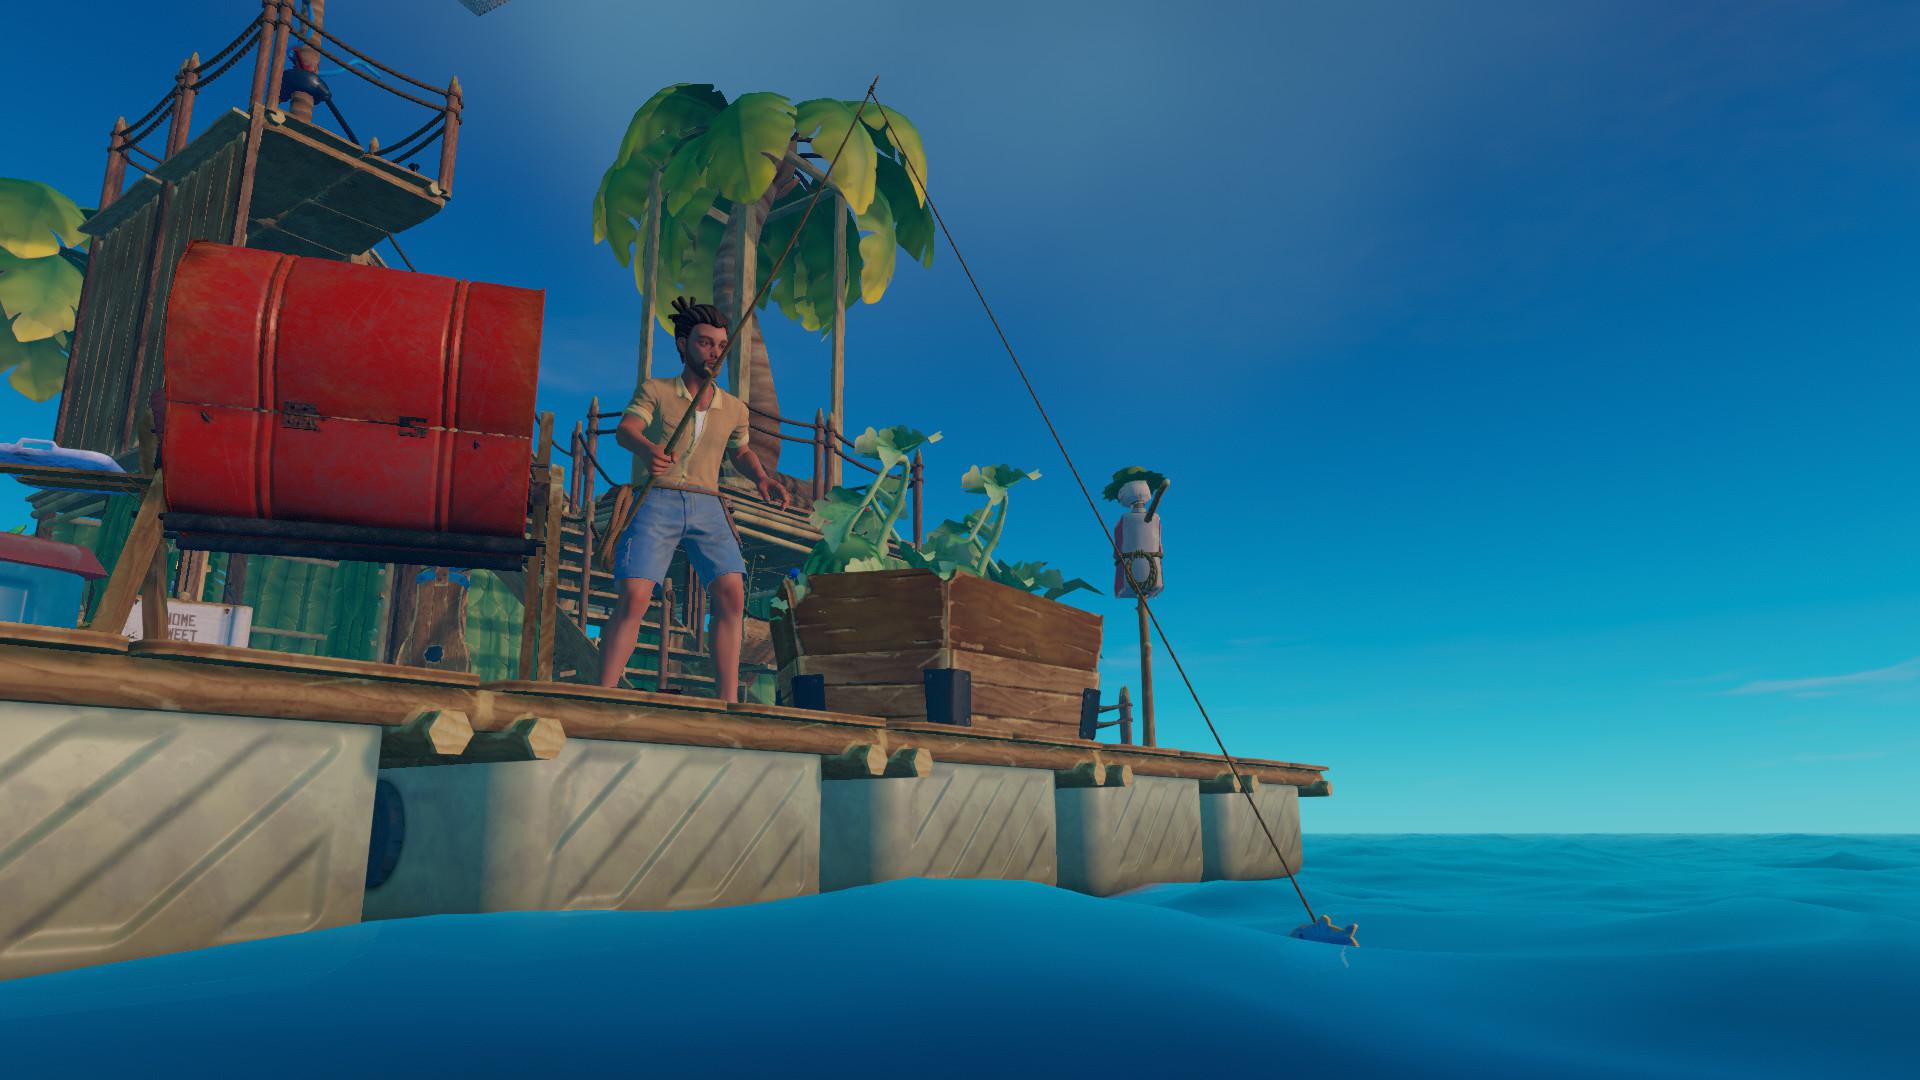 KHAiHOM.com - Raft